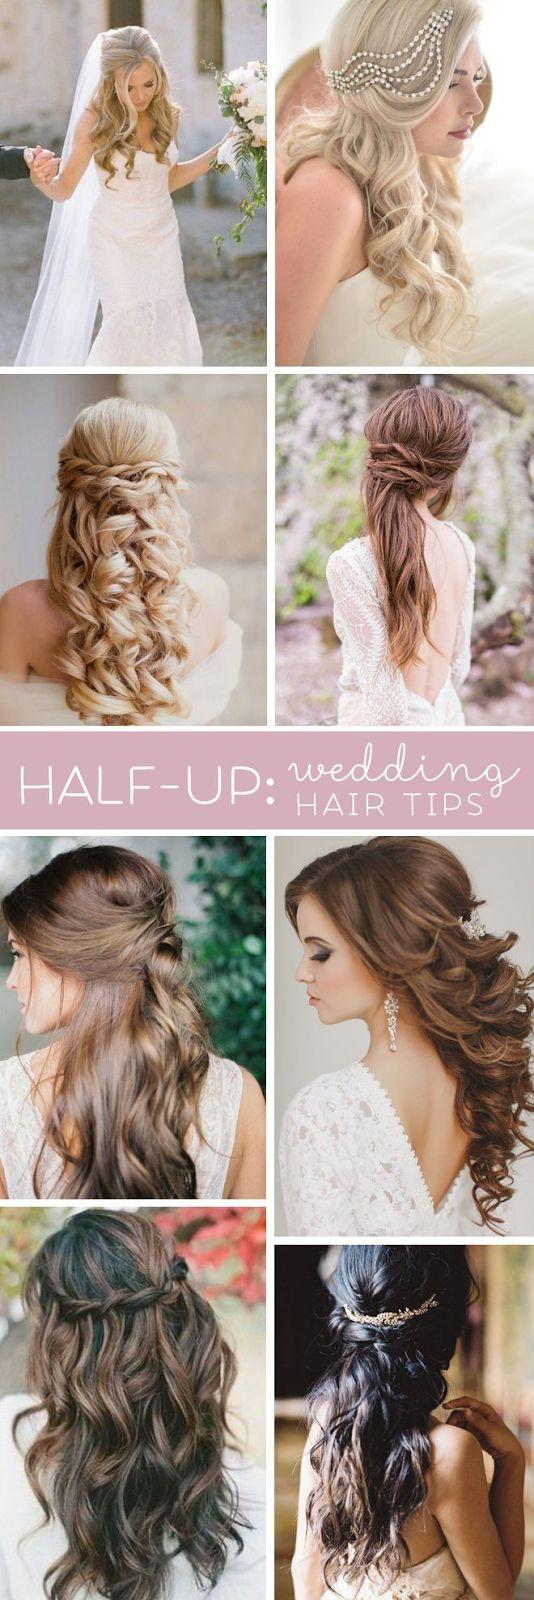 Wedding Hair Tips Half-up + Half-down Styles